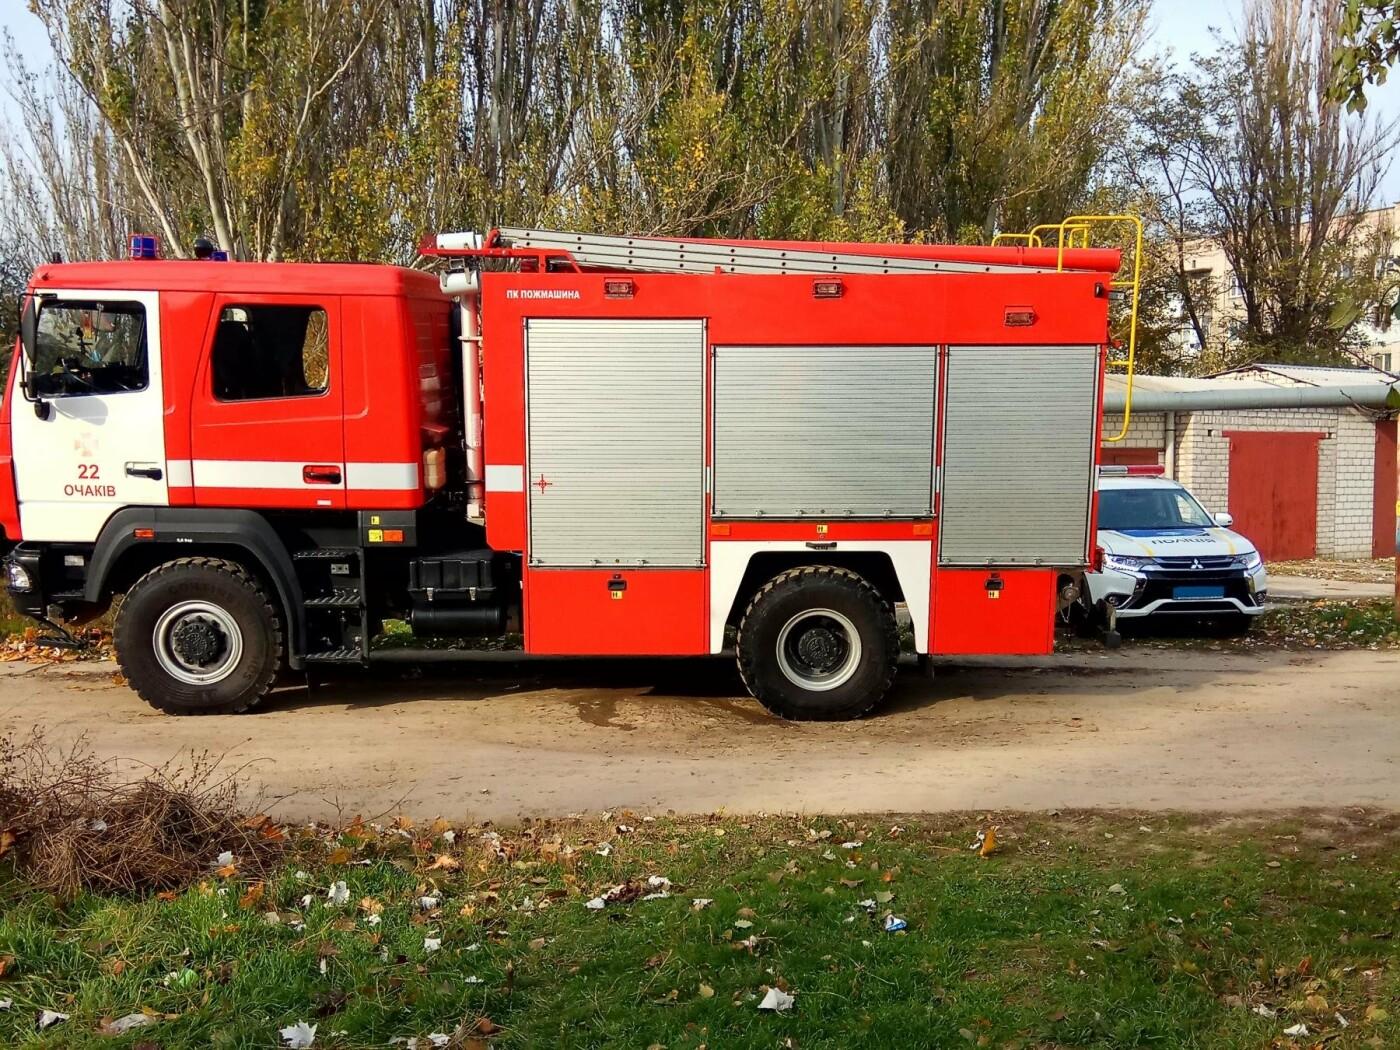 На Николаевщине спасатели предотвратили попытку суицида, - ФОТО, фото-2